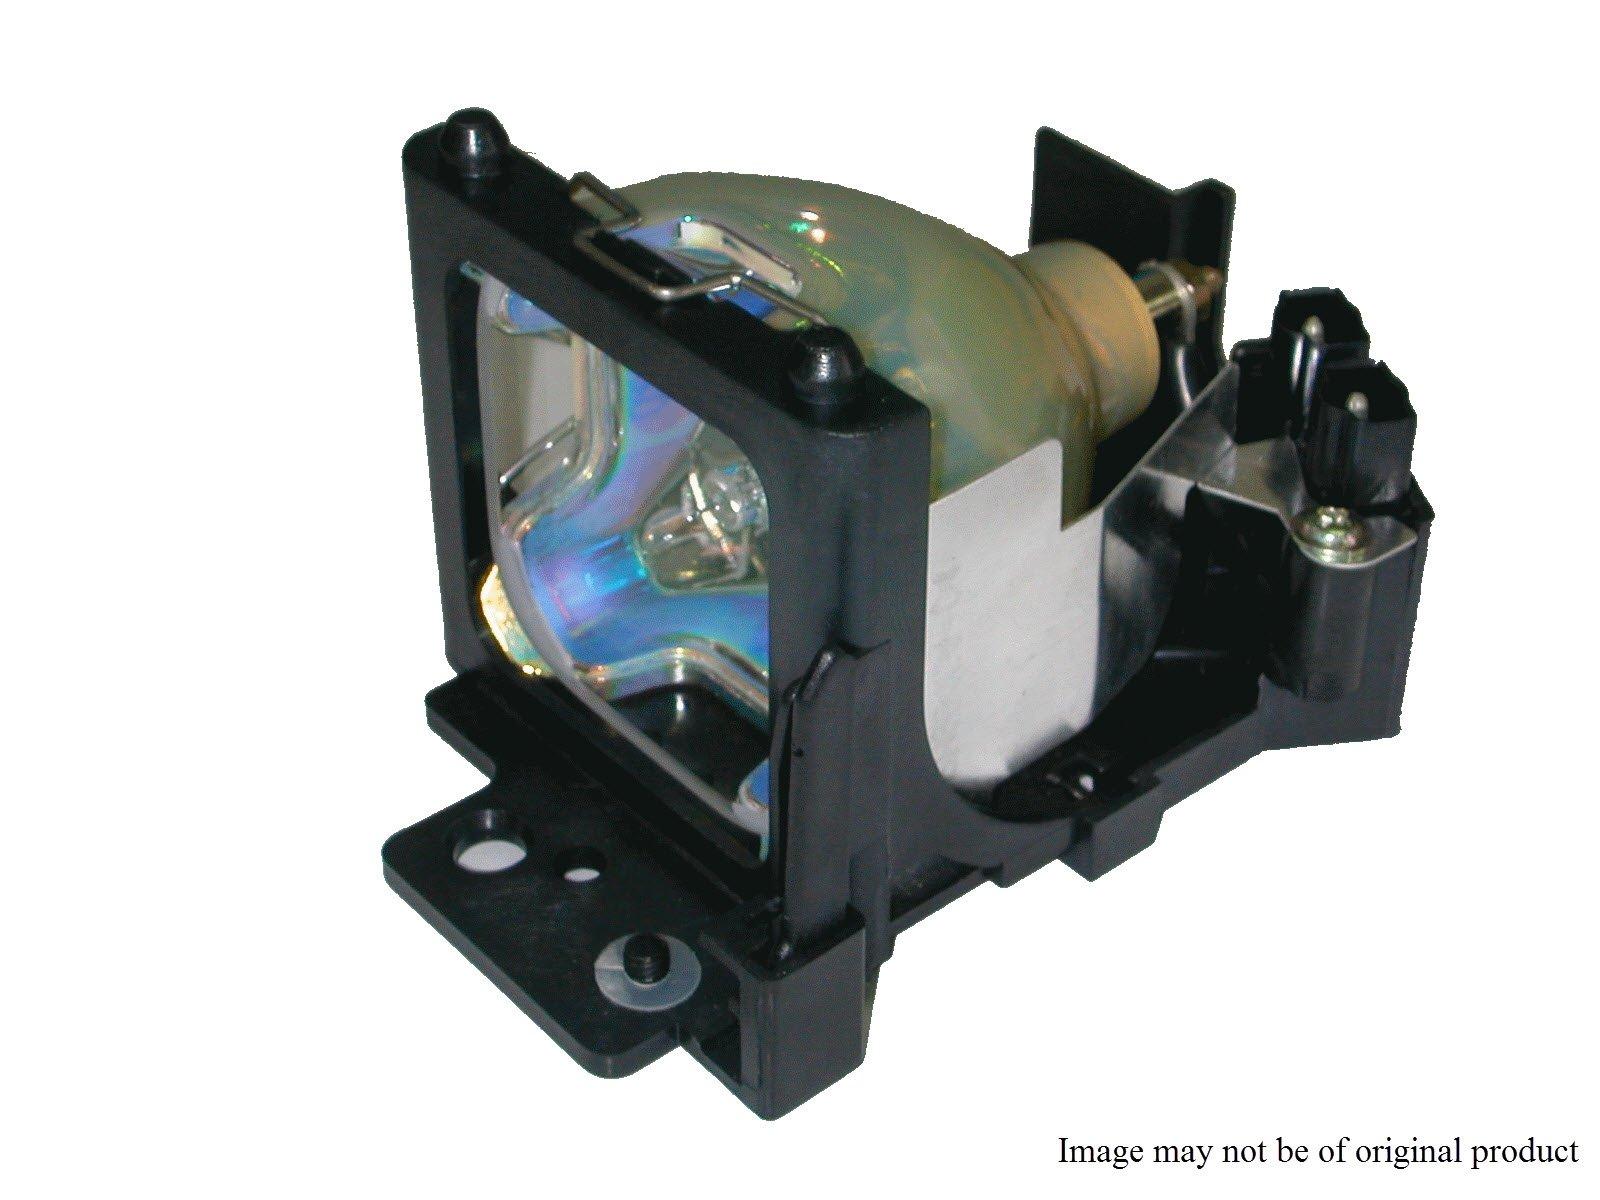 V7 VPL2629-1N REPL LAMP FOR SP-LAMP-078 FITS IN3124 IN3126 IN3128HD